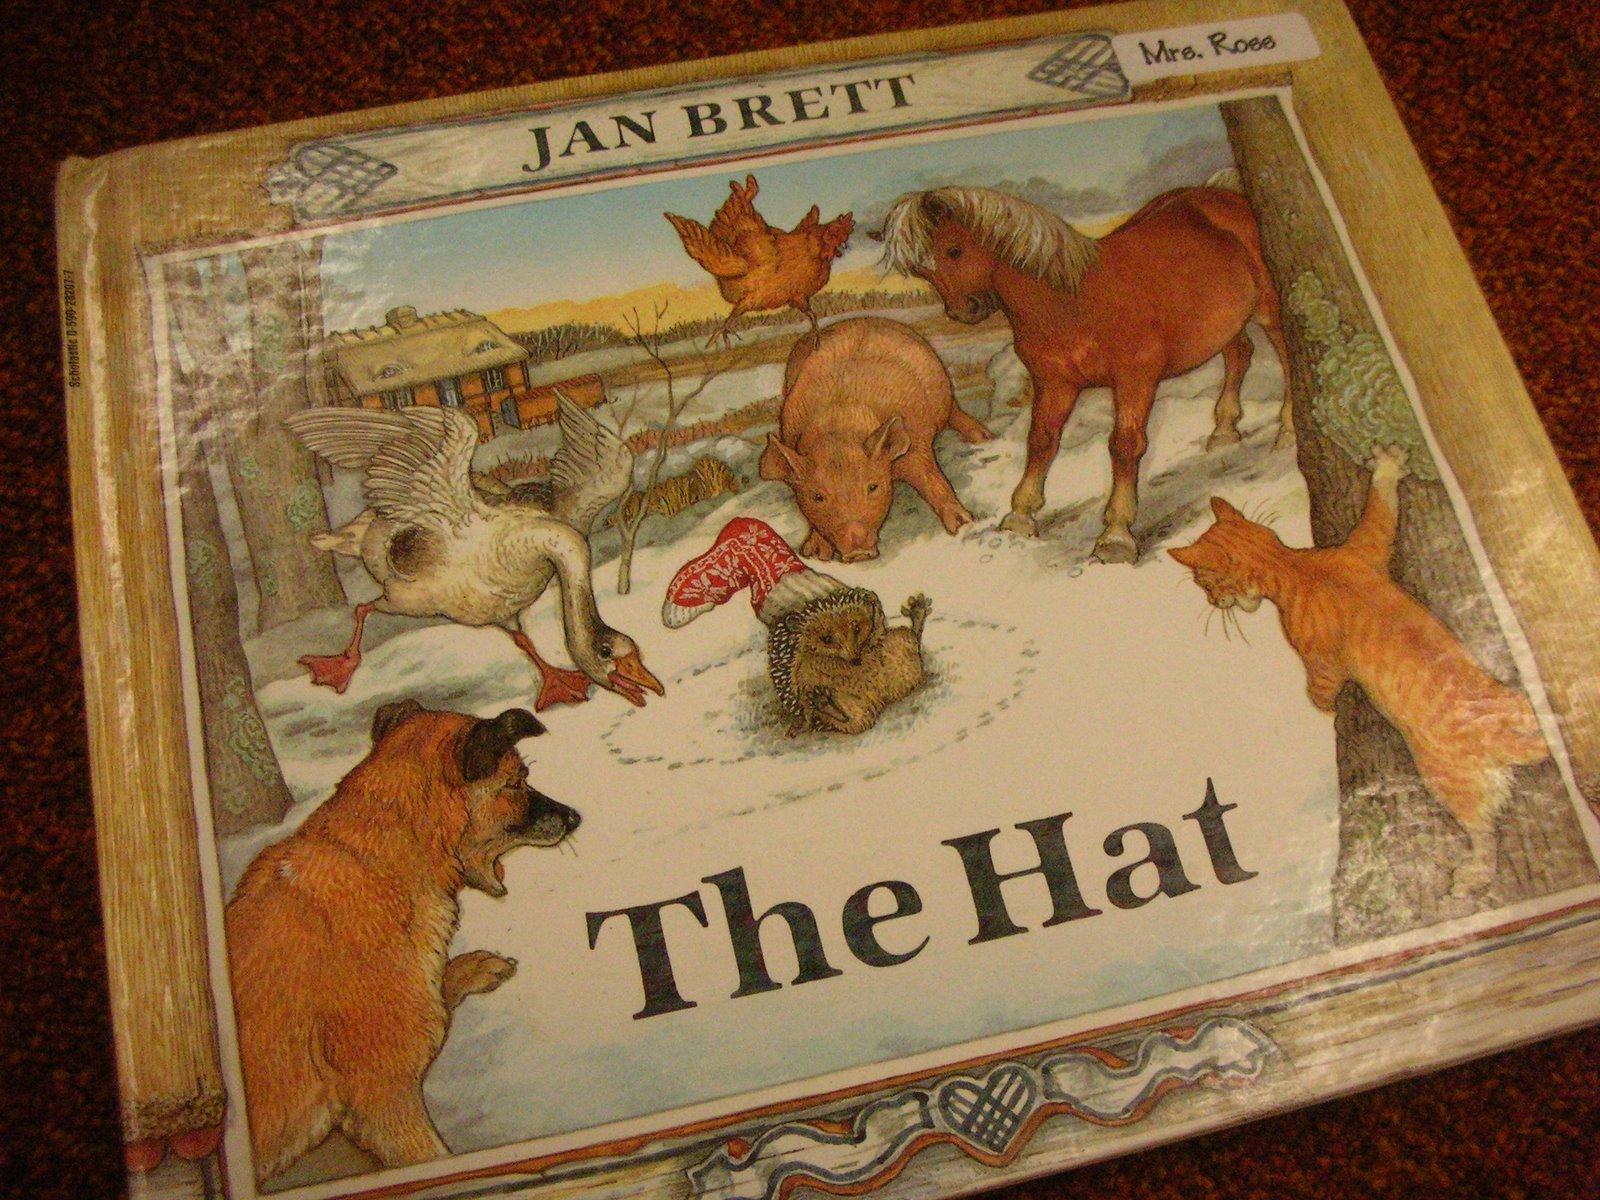 Search Results For The Hat Jan Brett Printables Calendar